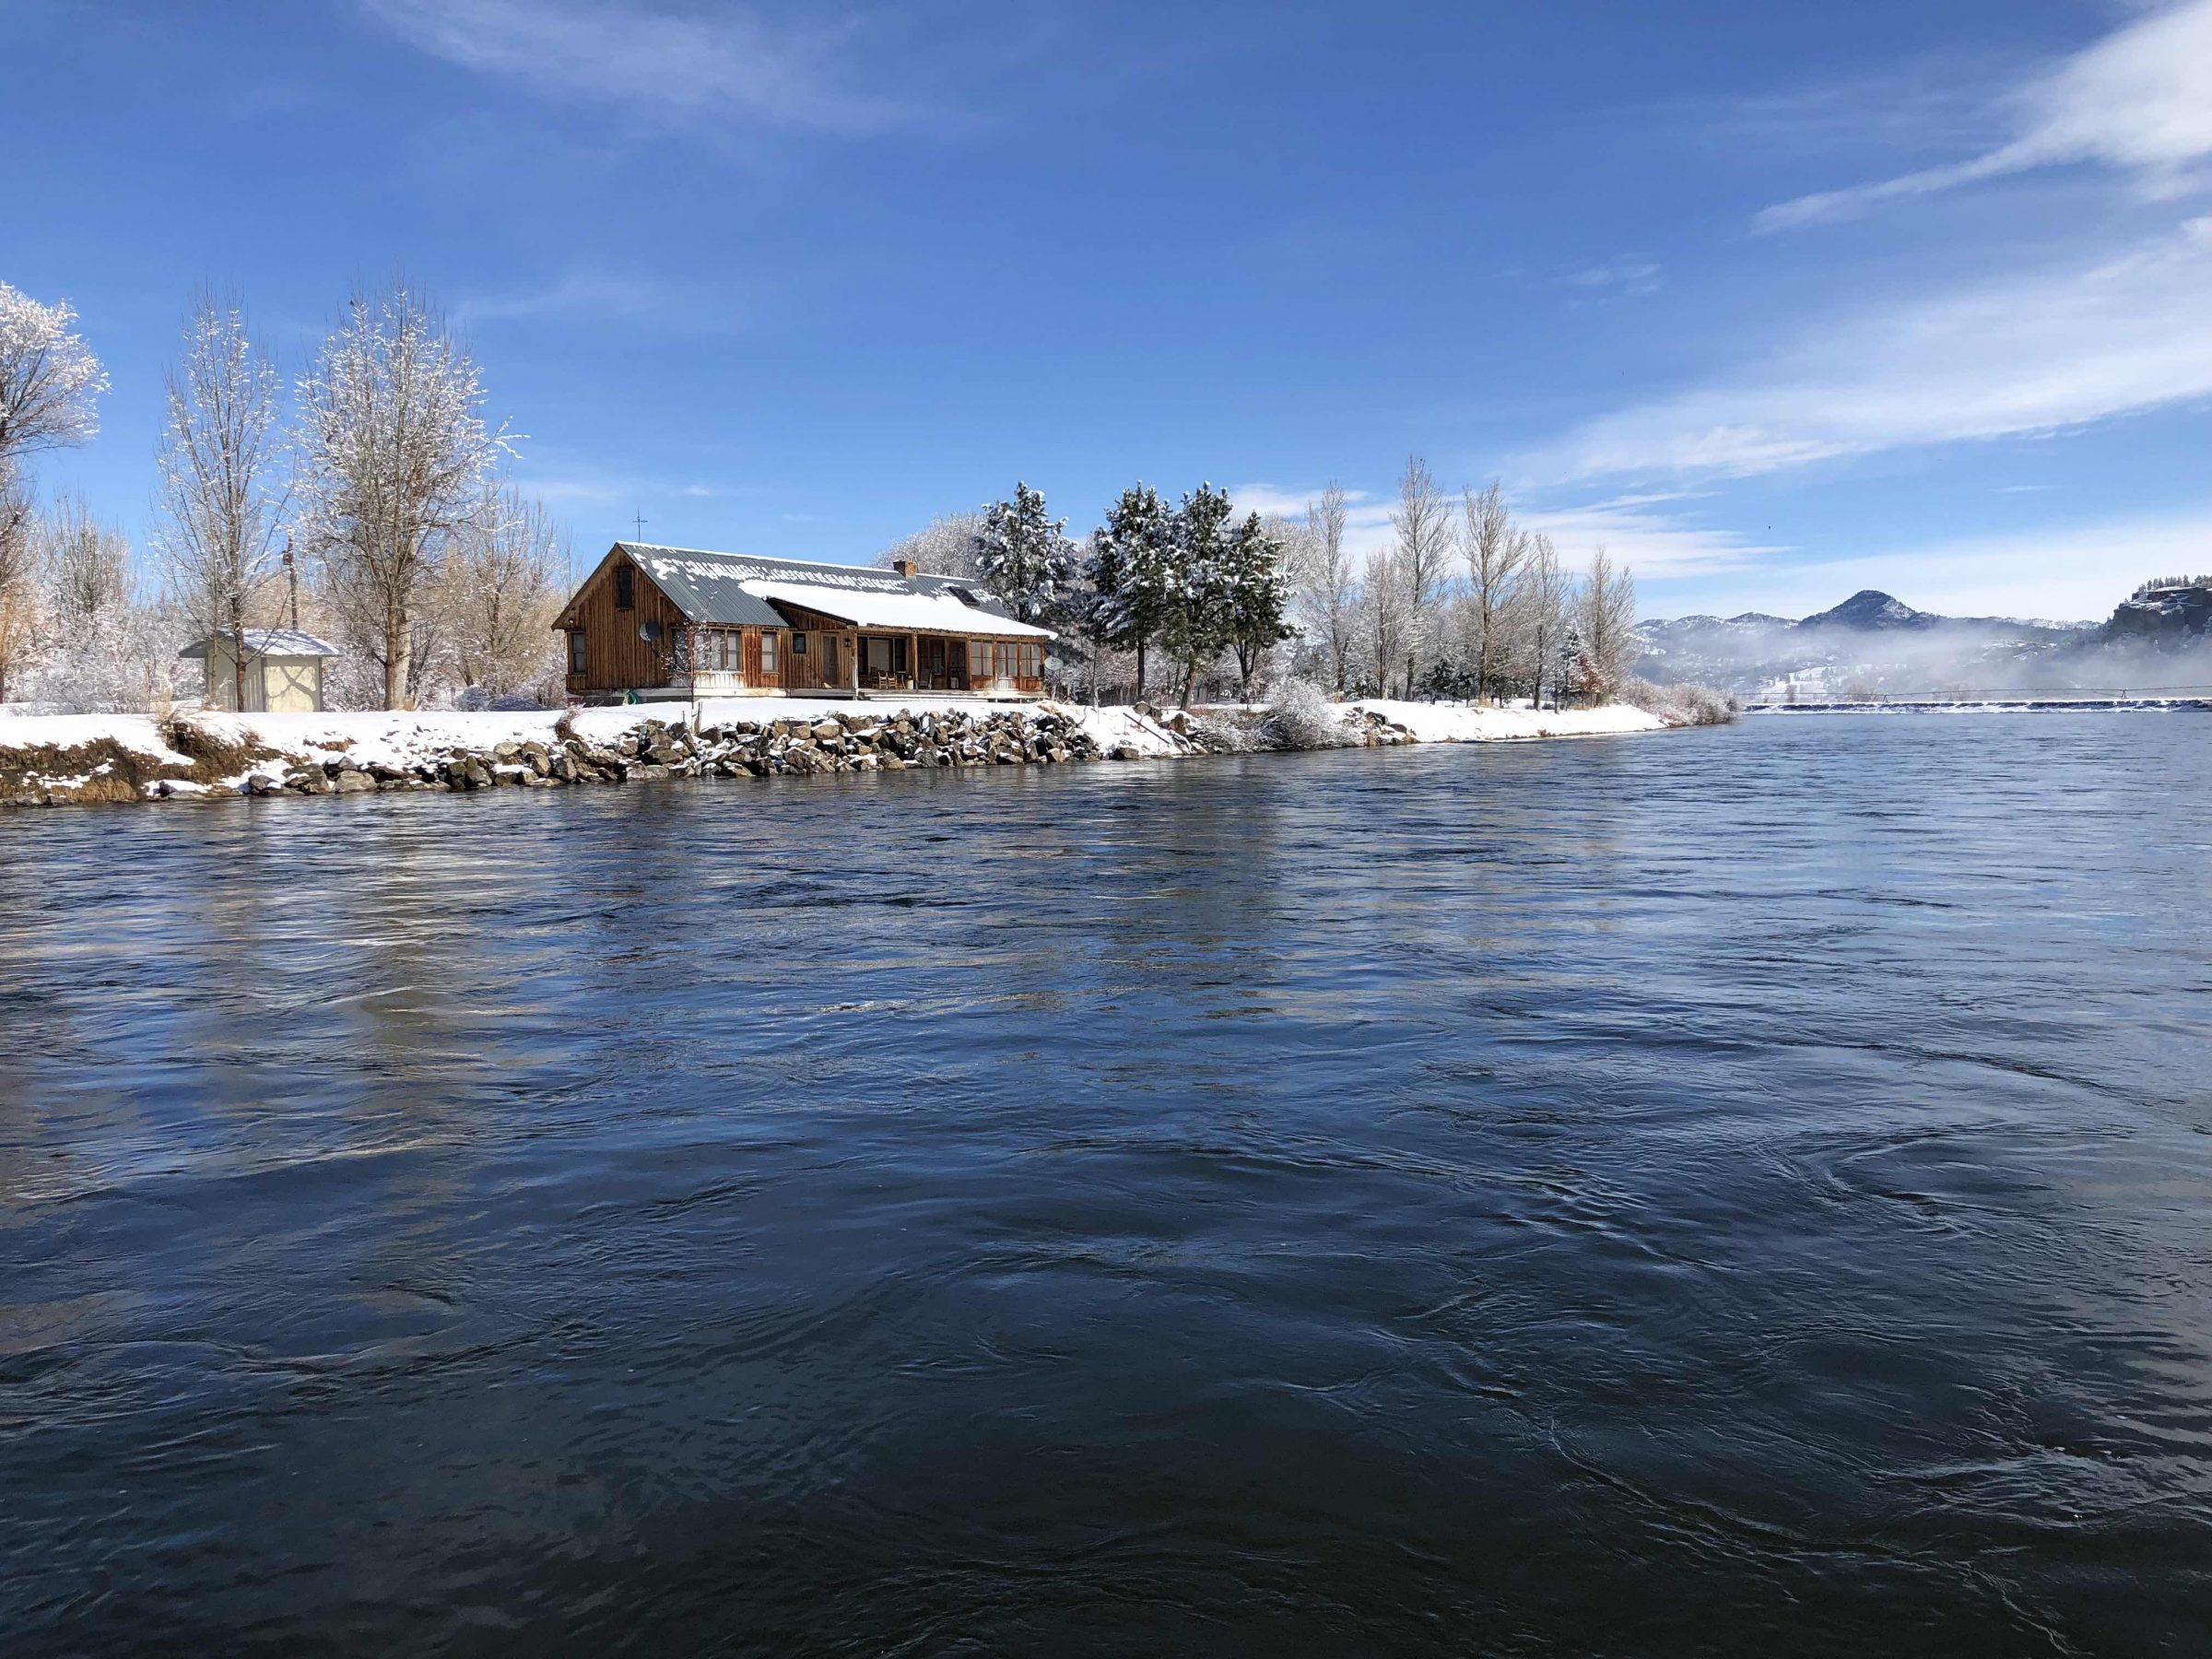 Monday Morning November 4th Missouri River Fishing Report